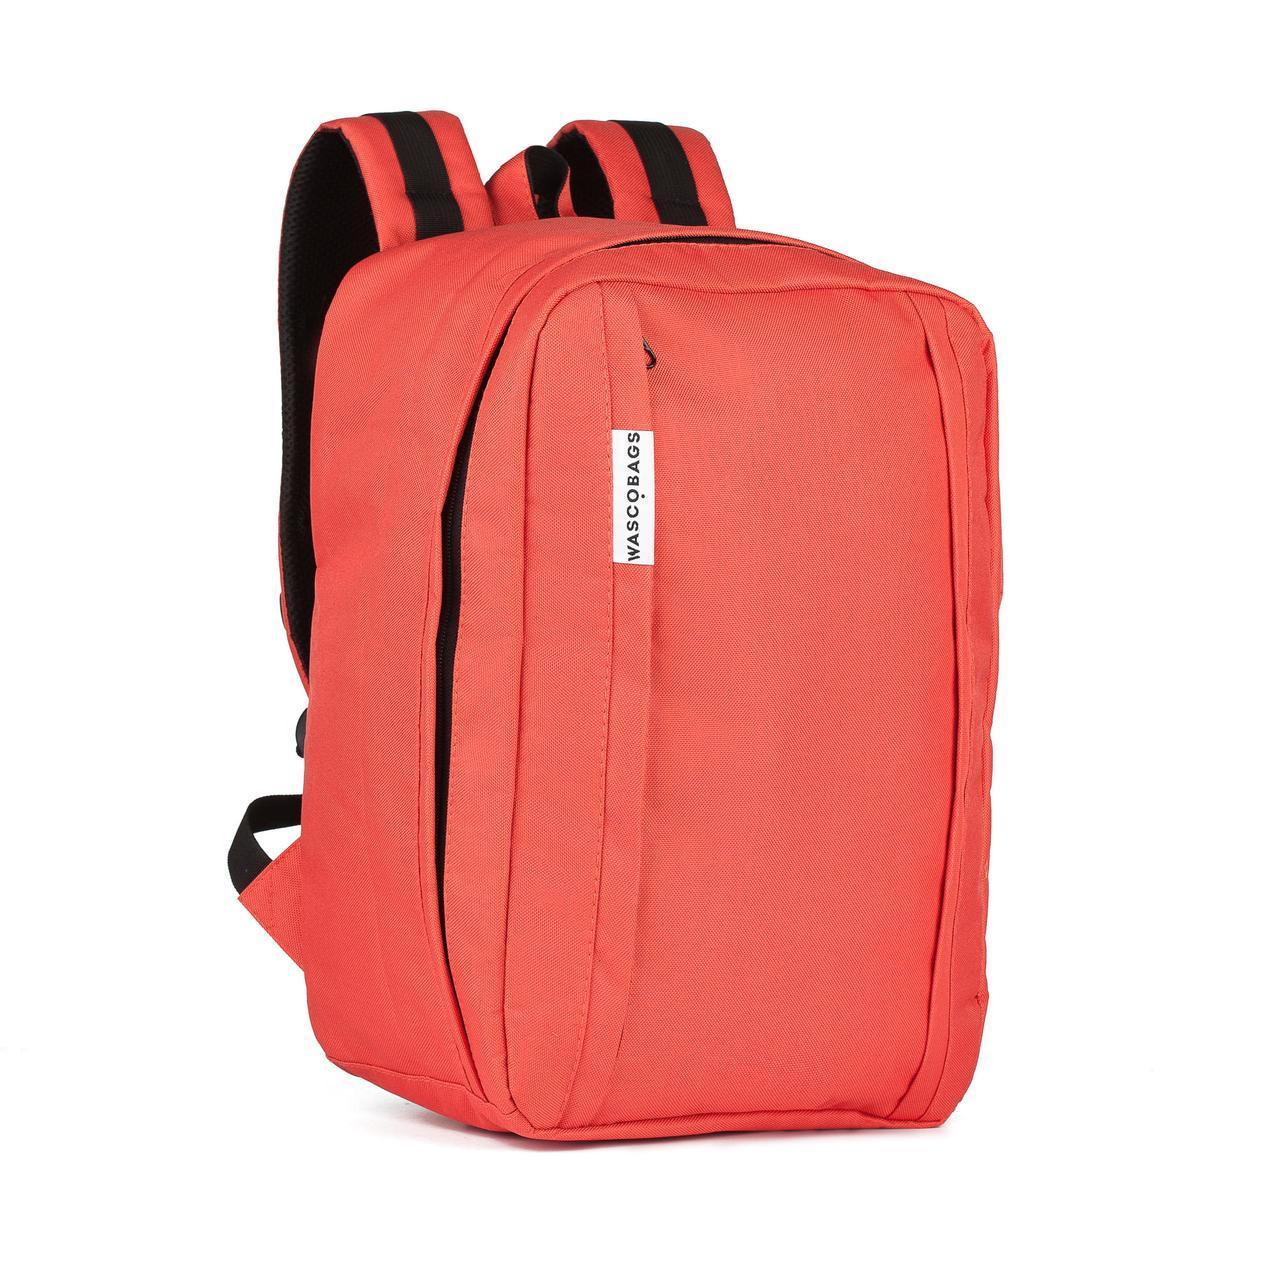 Рюкзак для ручной клади Wascobags 40x30x20 WZ Коралл